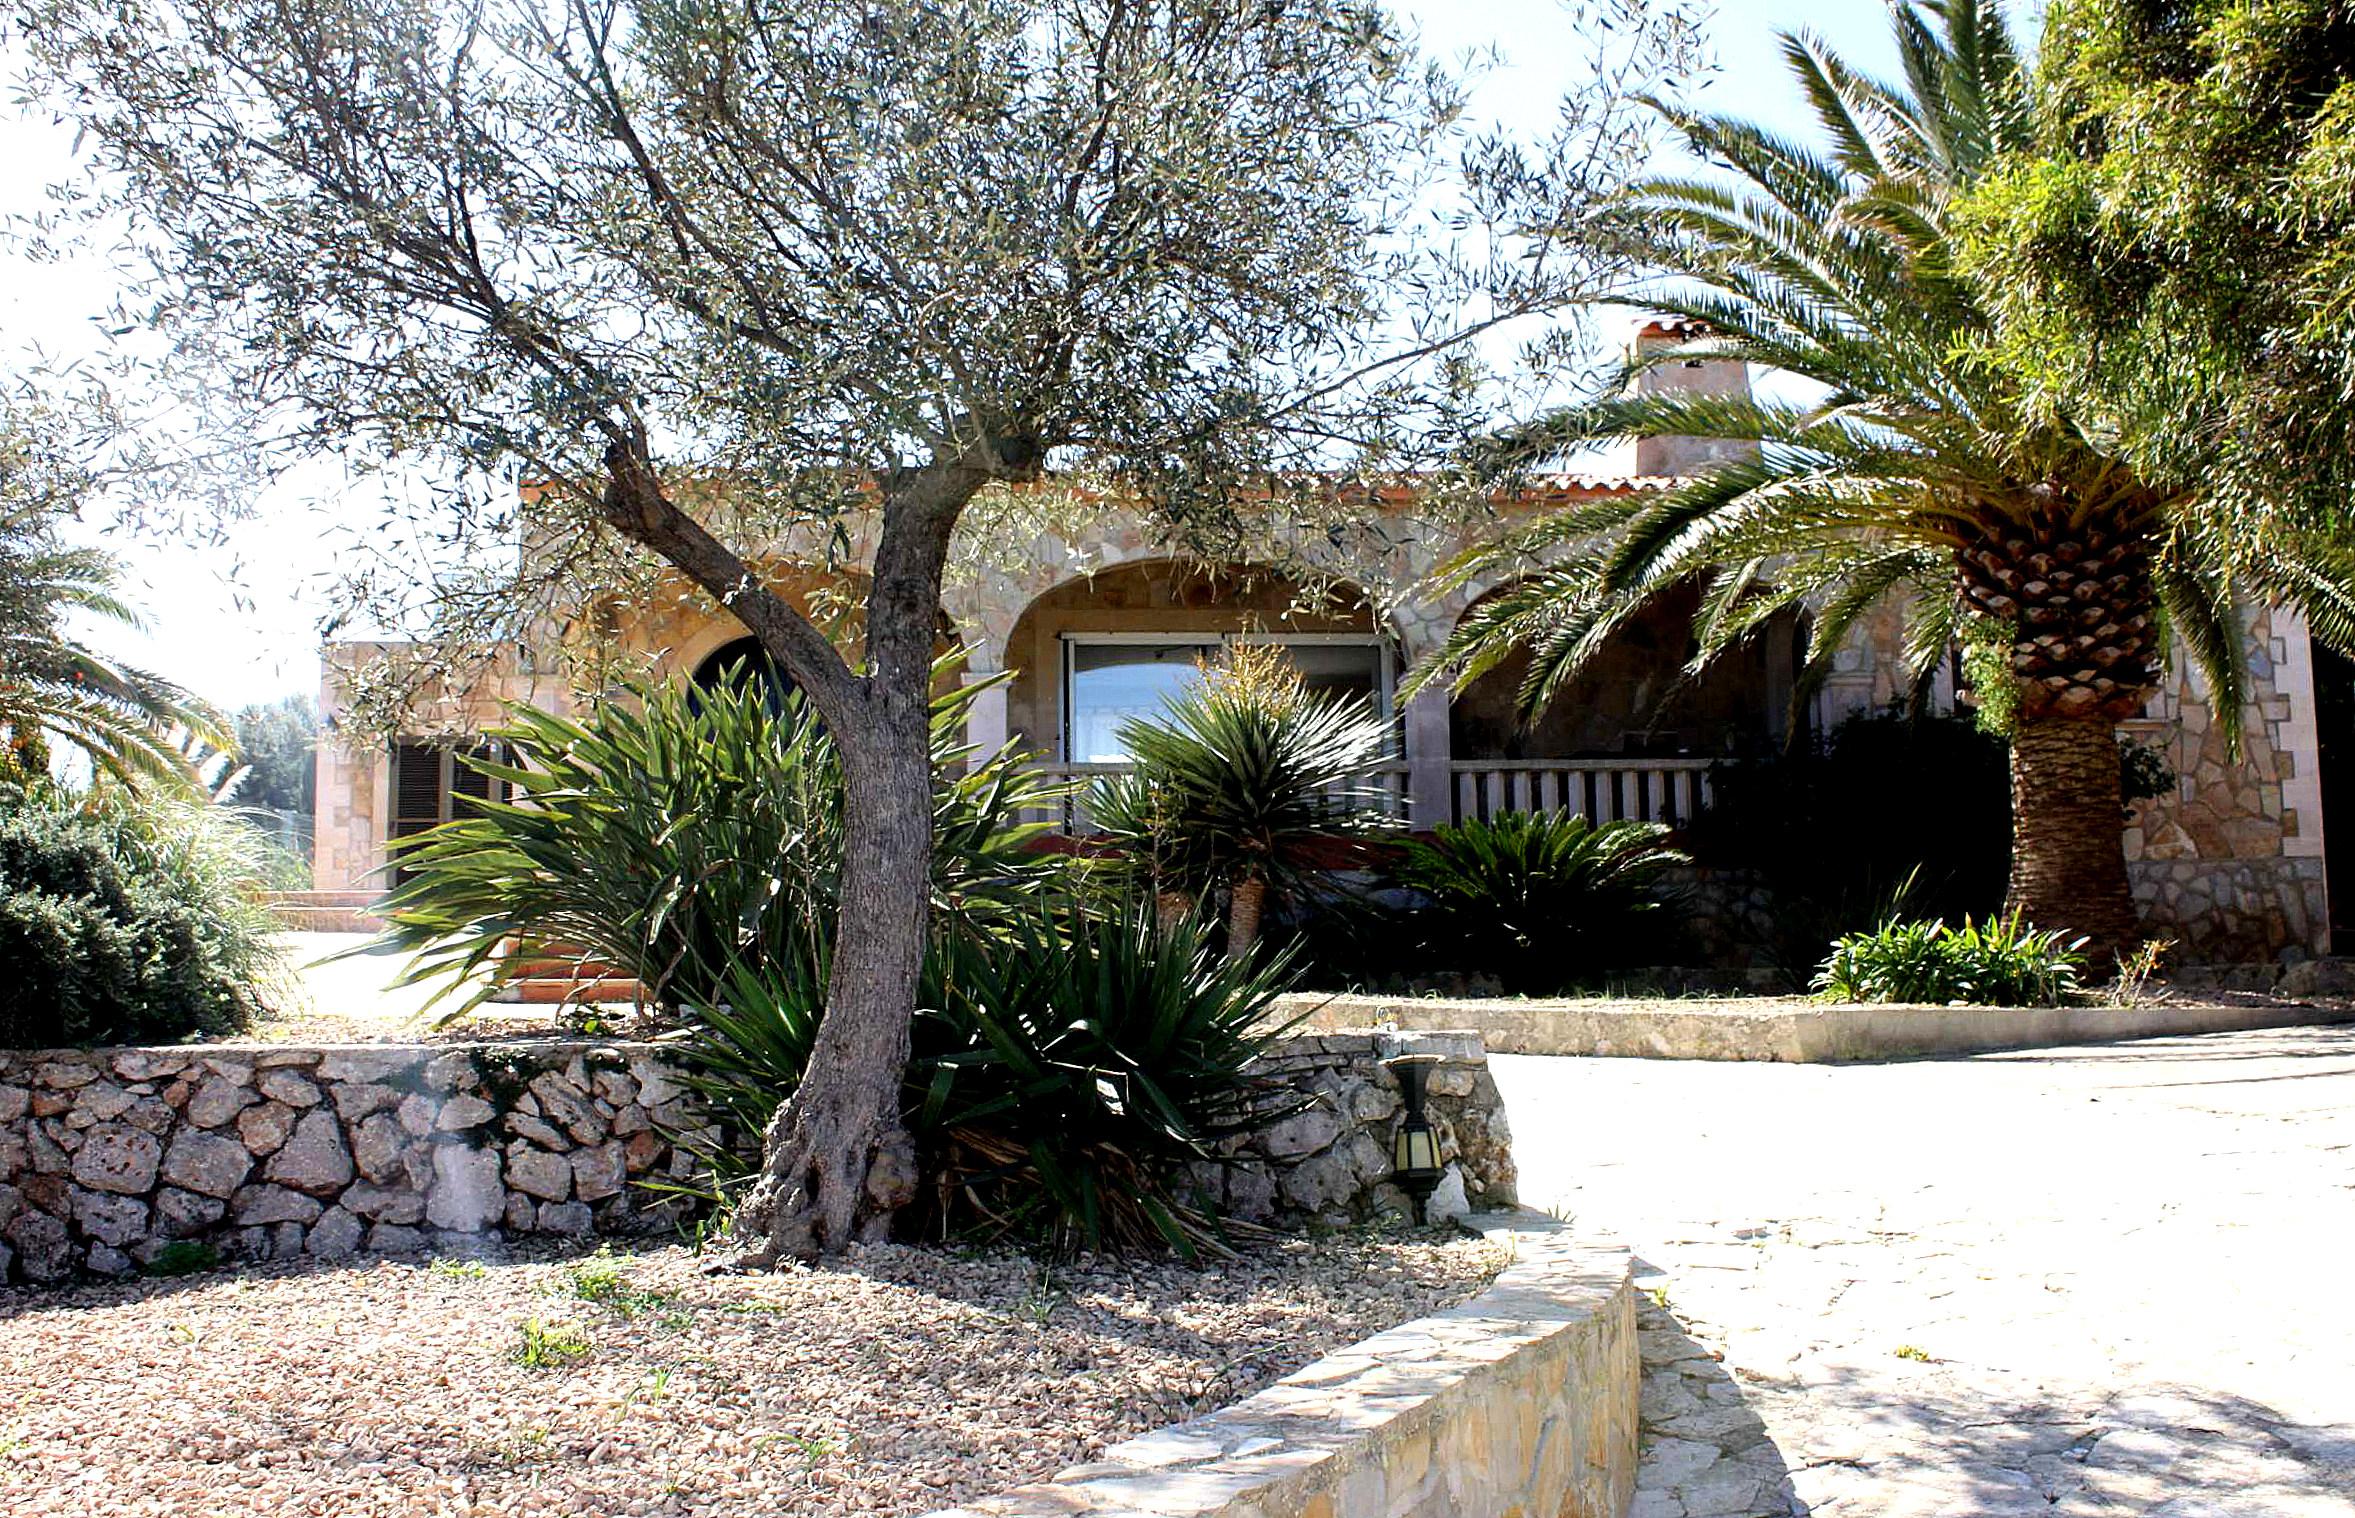 Cala Murada | Mallorca, Gastronomie, Restaurant, Café, Bar, Club ...